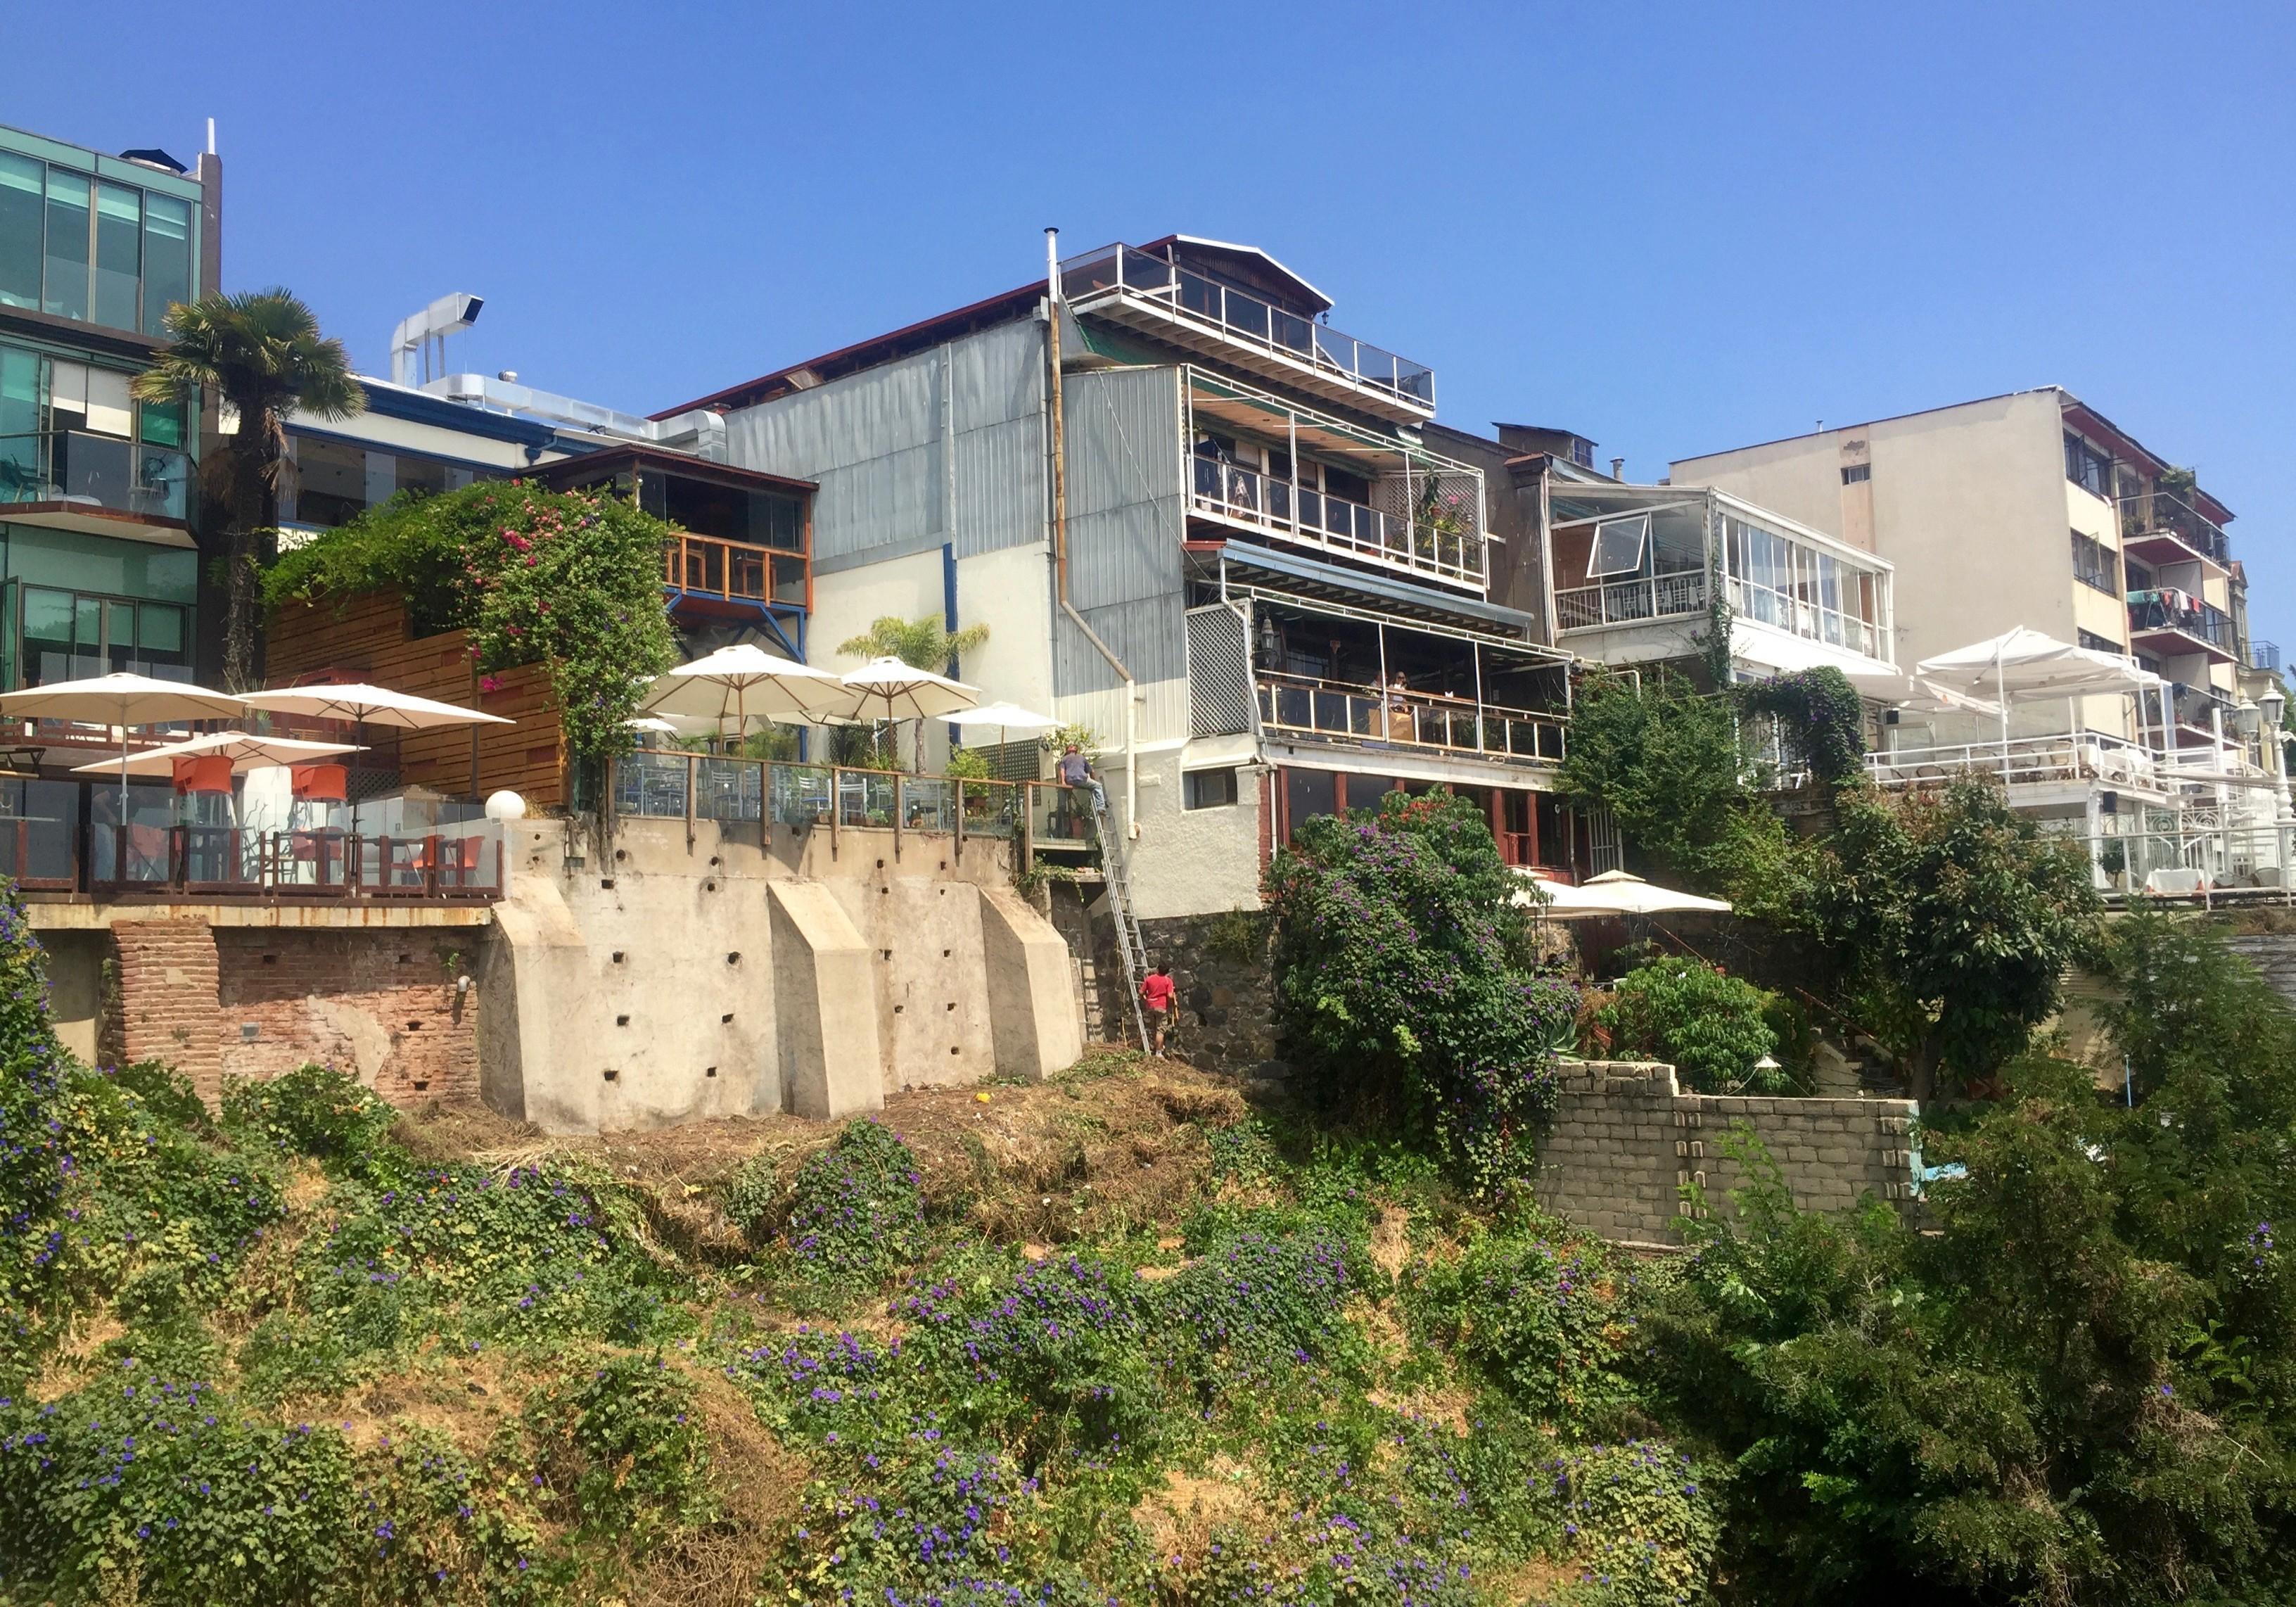 cliffside bars and restaurants